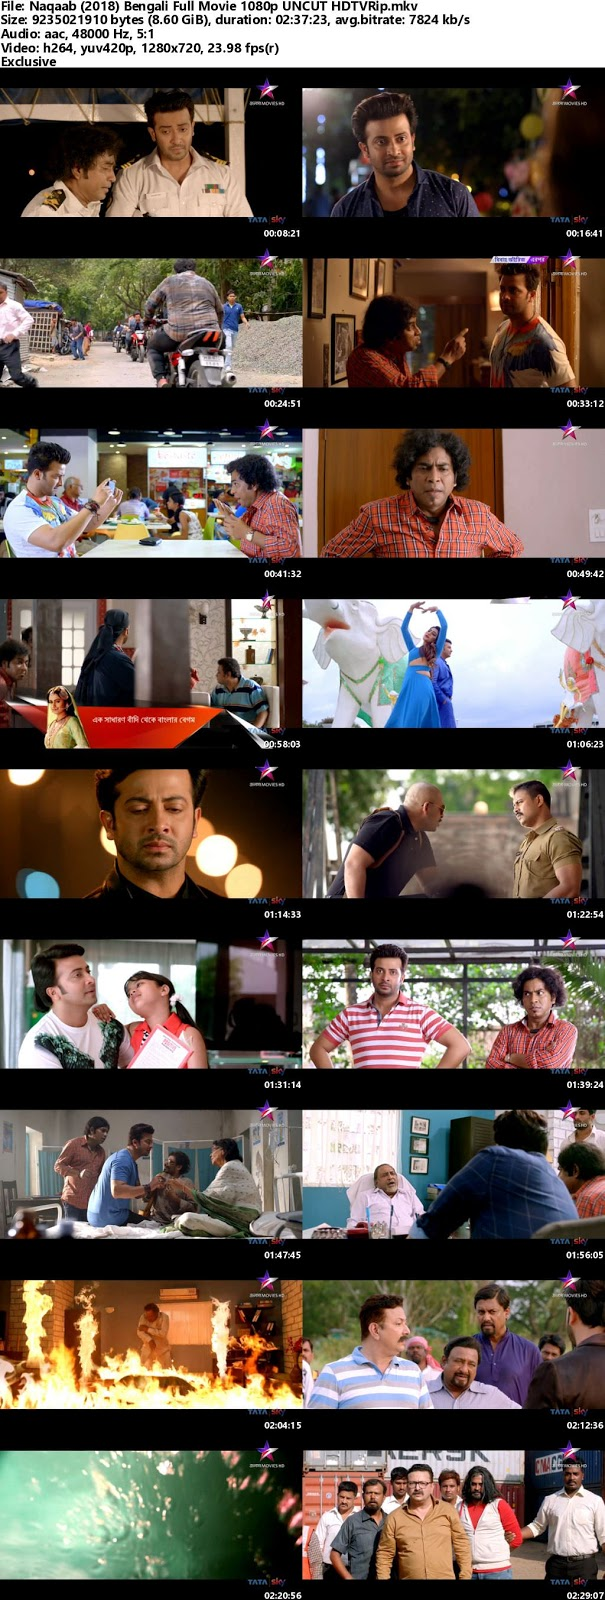 Naqaab (2018 ) Bangla Full Movie Download In 720p HD